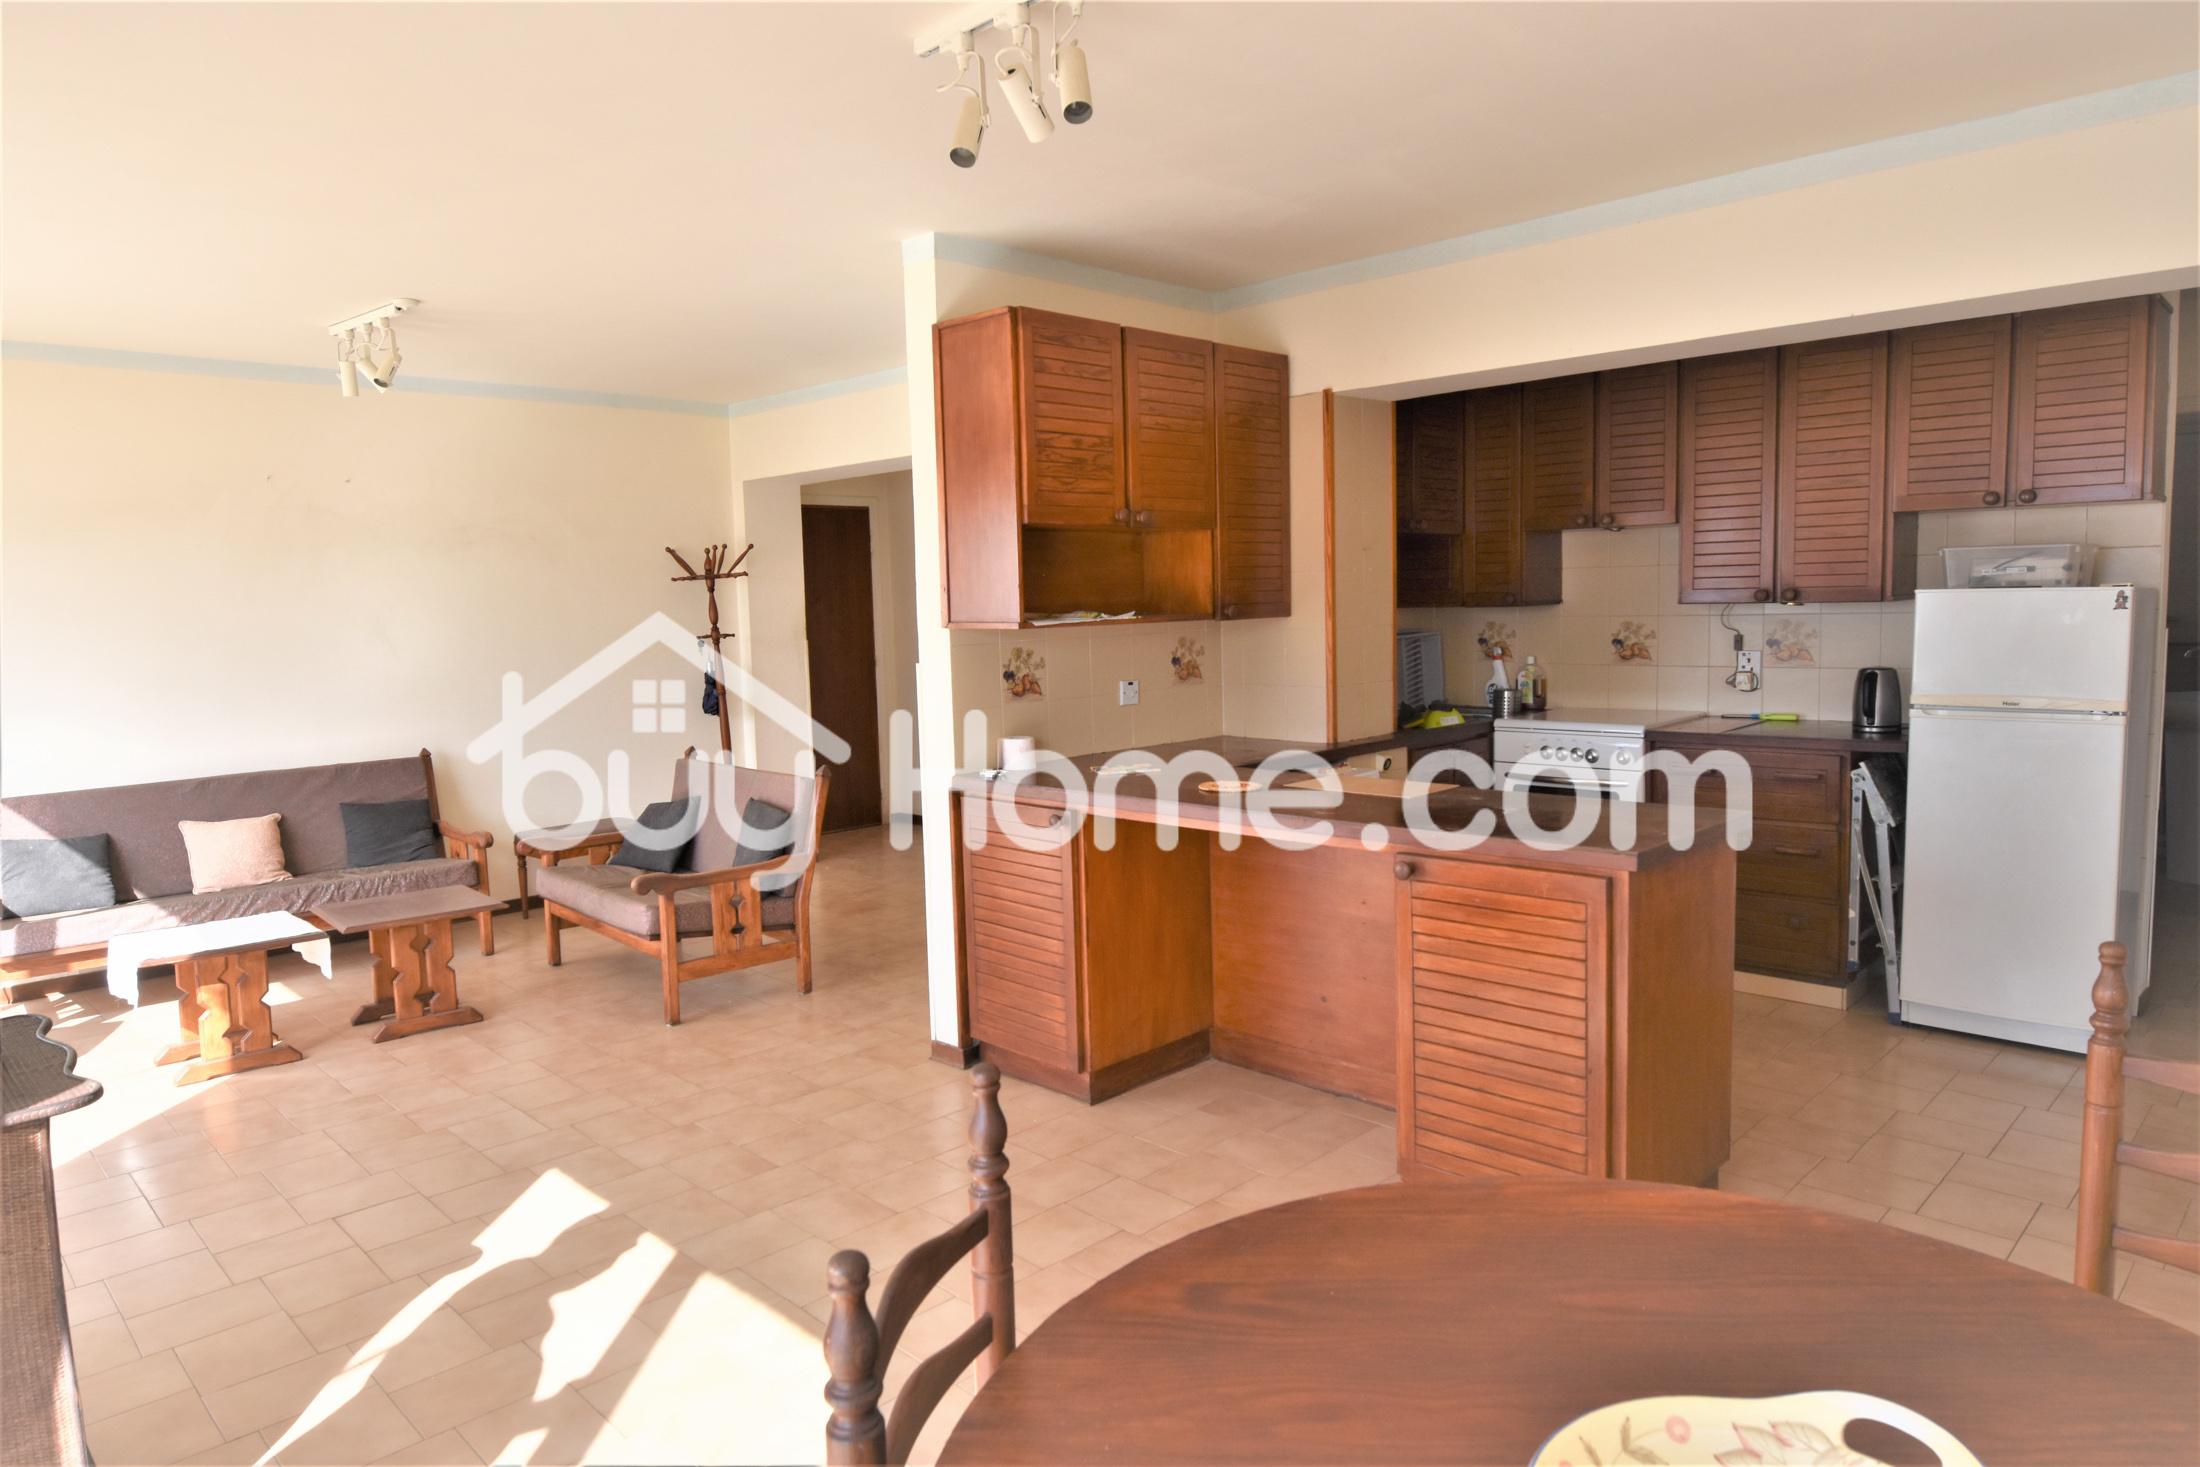 3 Bedroom Sea View Apt | BuyHome